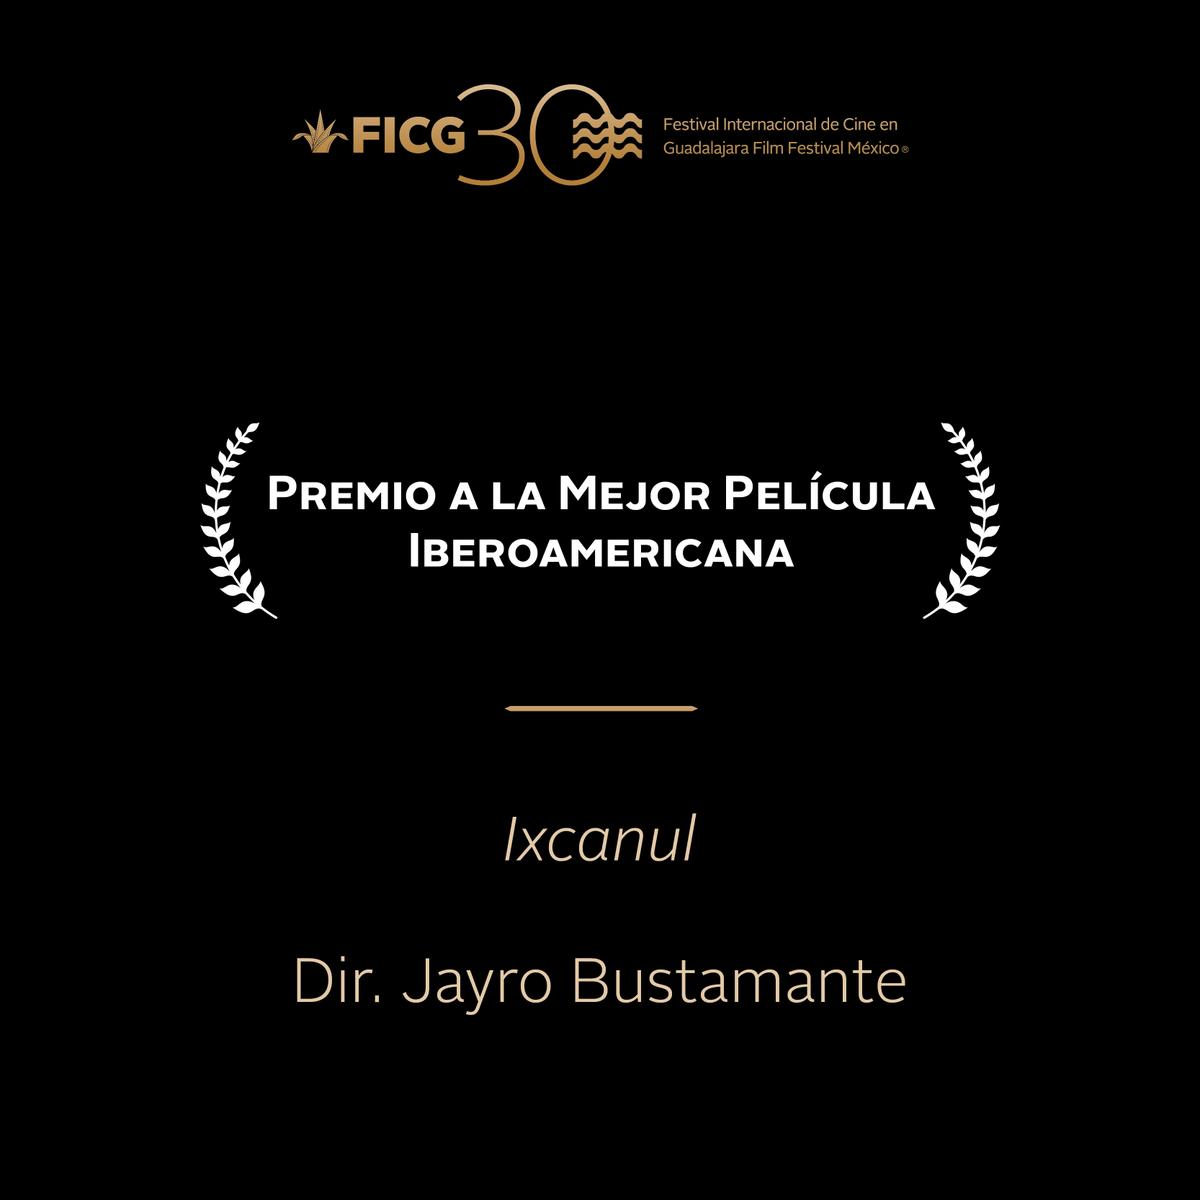 #FICG30  - Premio a Mejor Película Iberoamericana. ''Ixcanul'' / Dir. Jayro Bustamante. http://t.co/uIF7KvyDxH